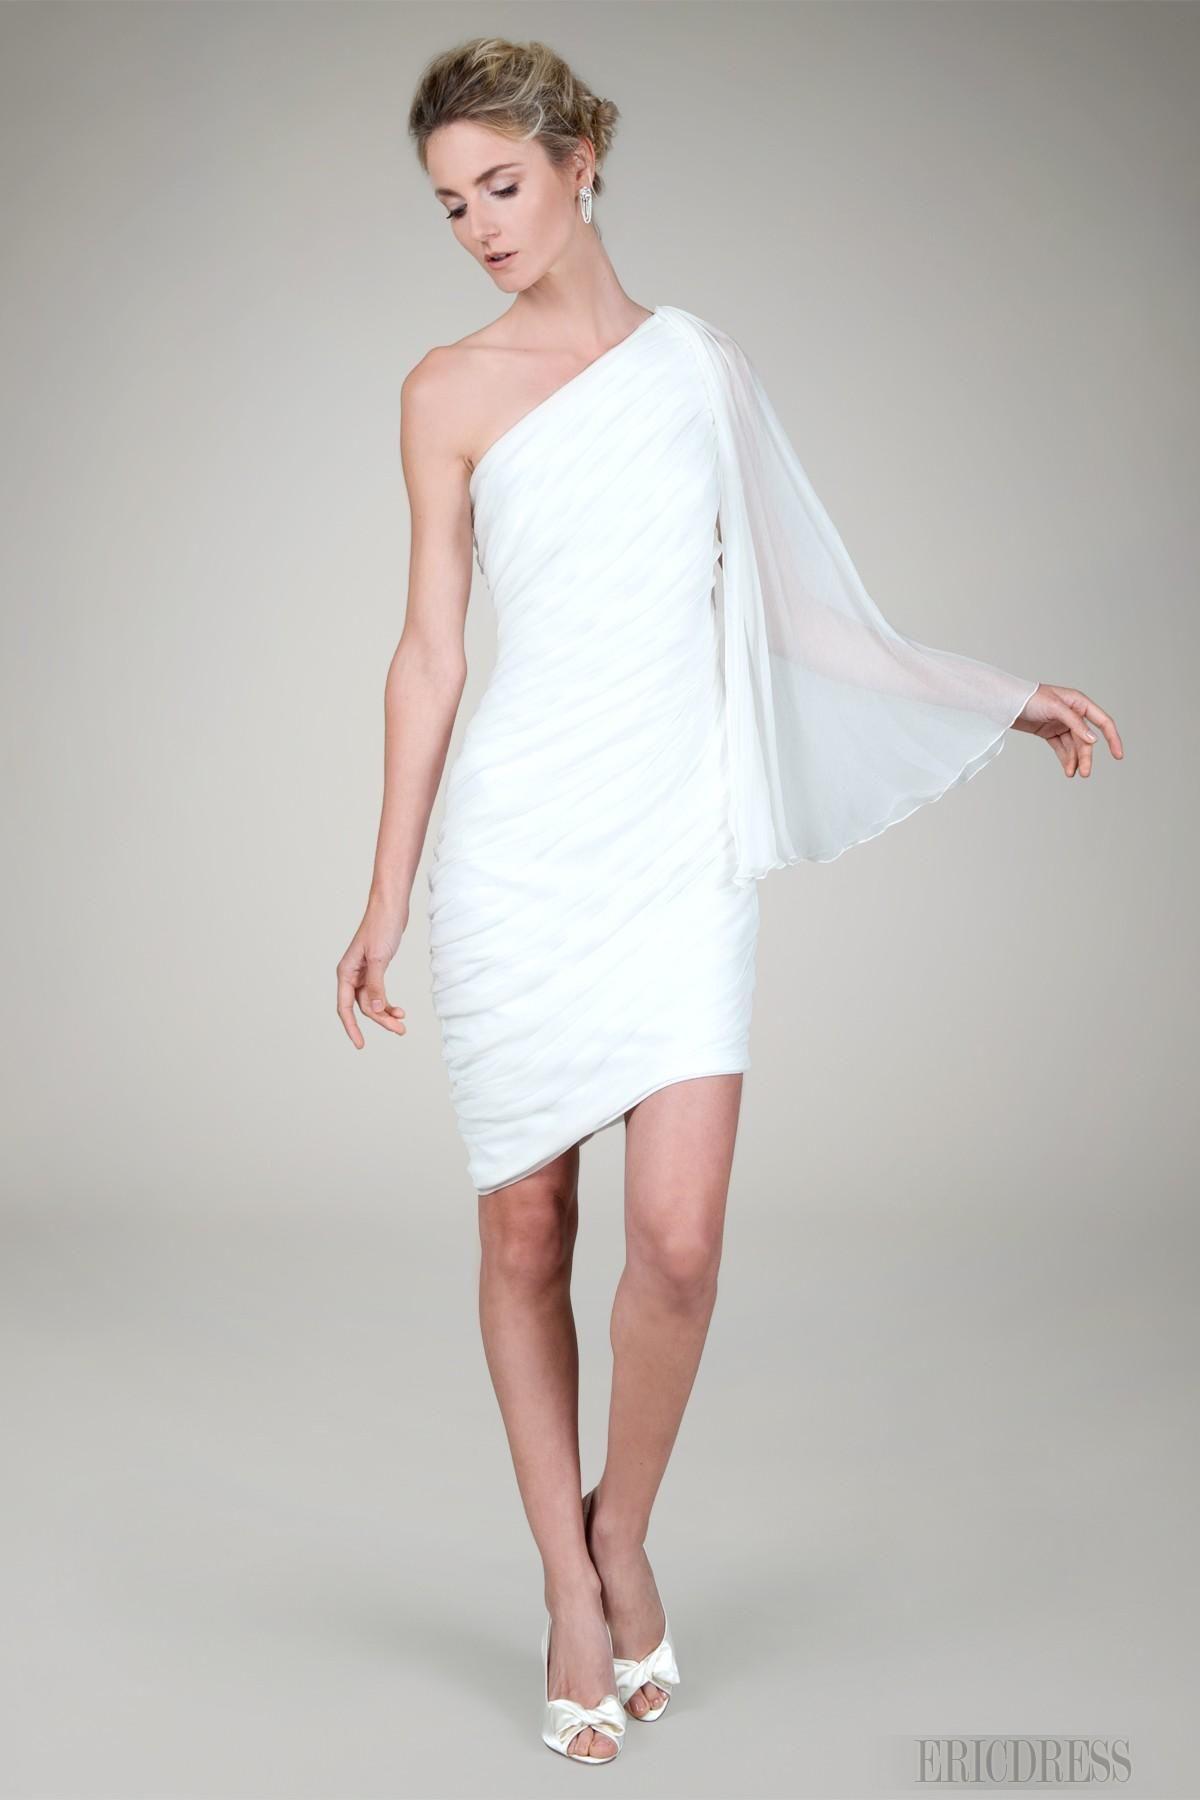 www.ericdress.com - Chic Sheath Column One Sleeve Short Mini Length Beach Wedding Dressi